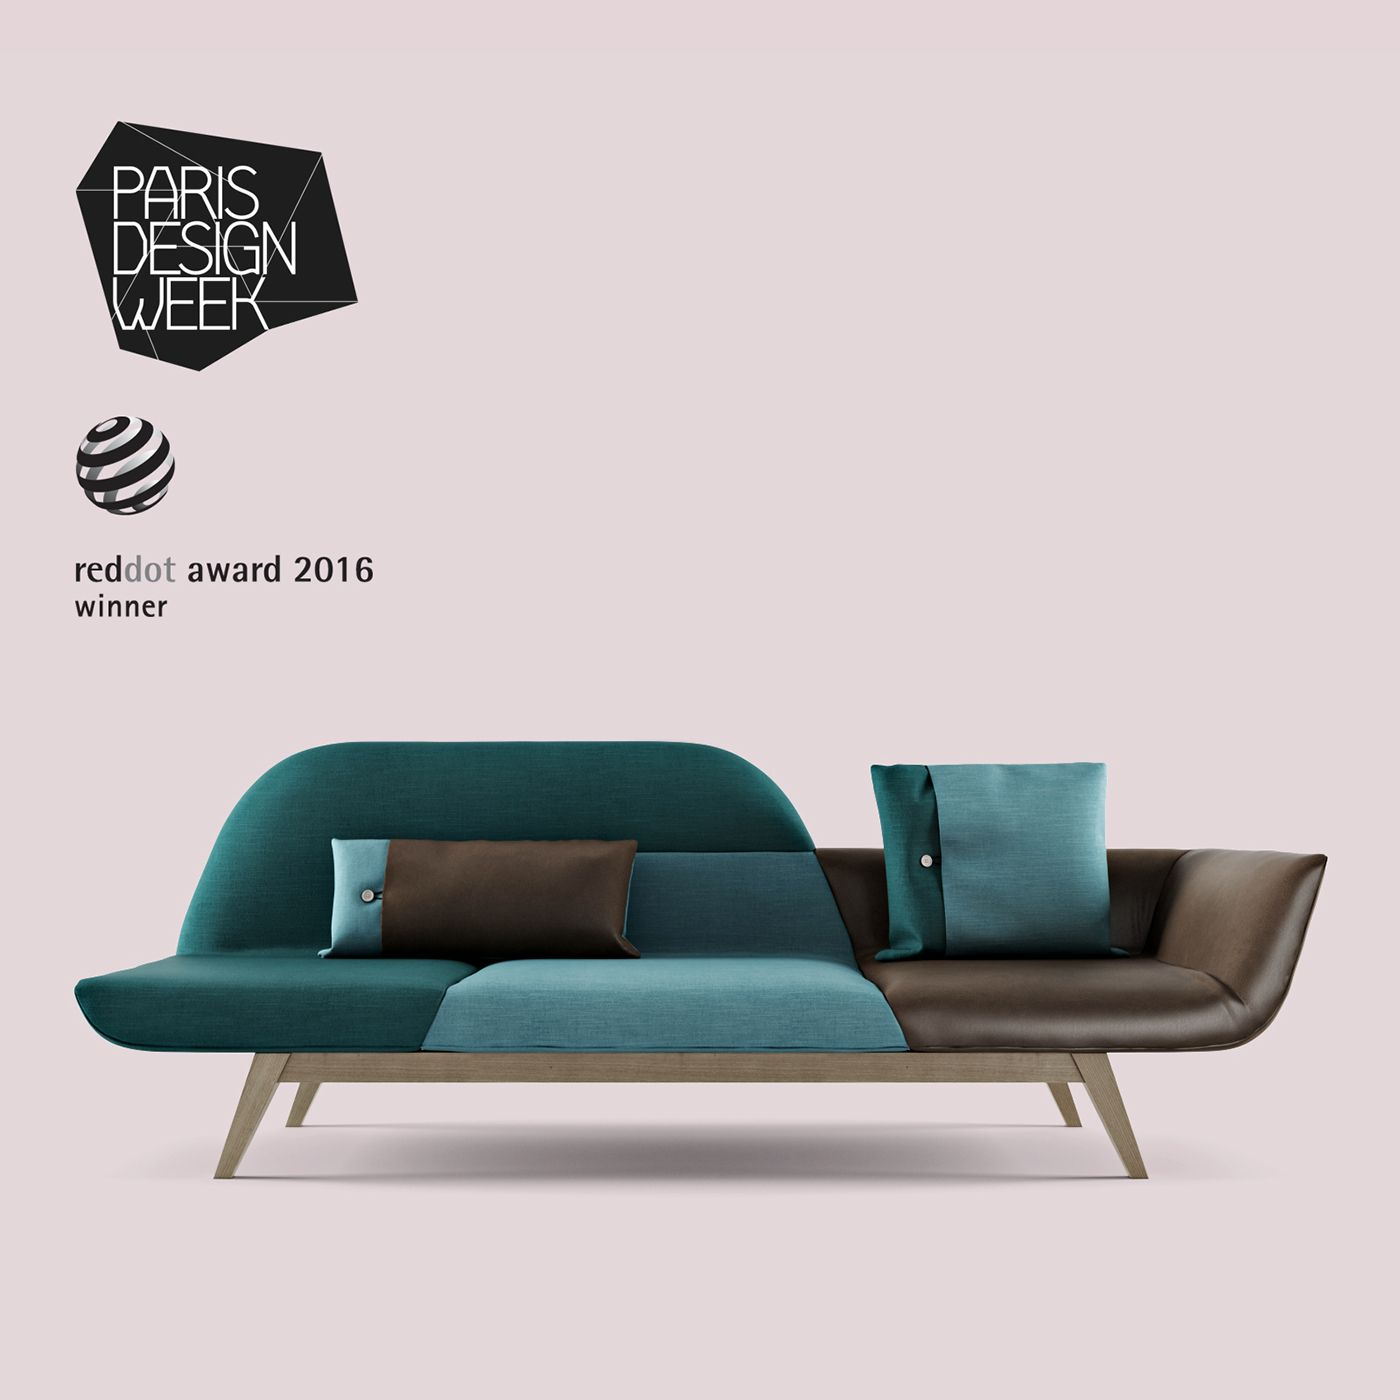 TAO Sofa on Behance f u r n i t u r e Pinterest